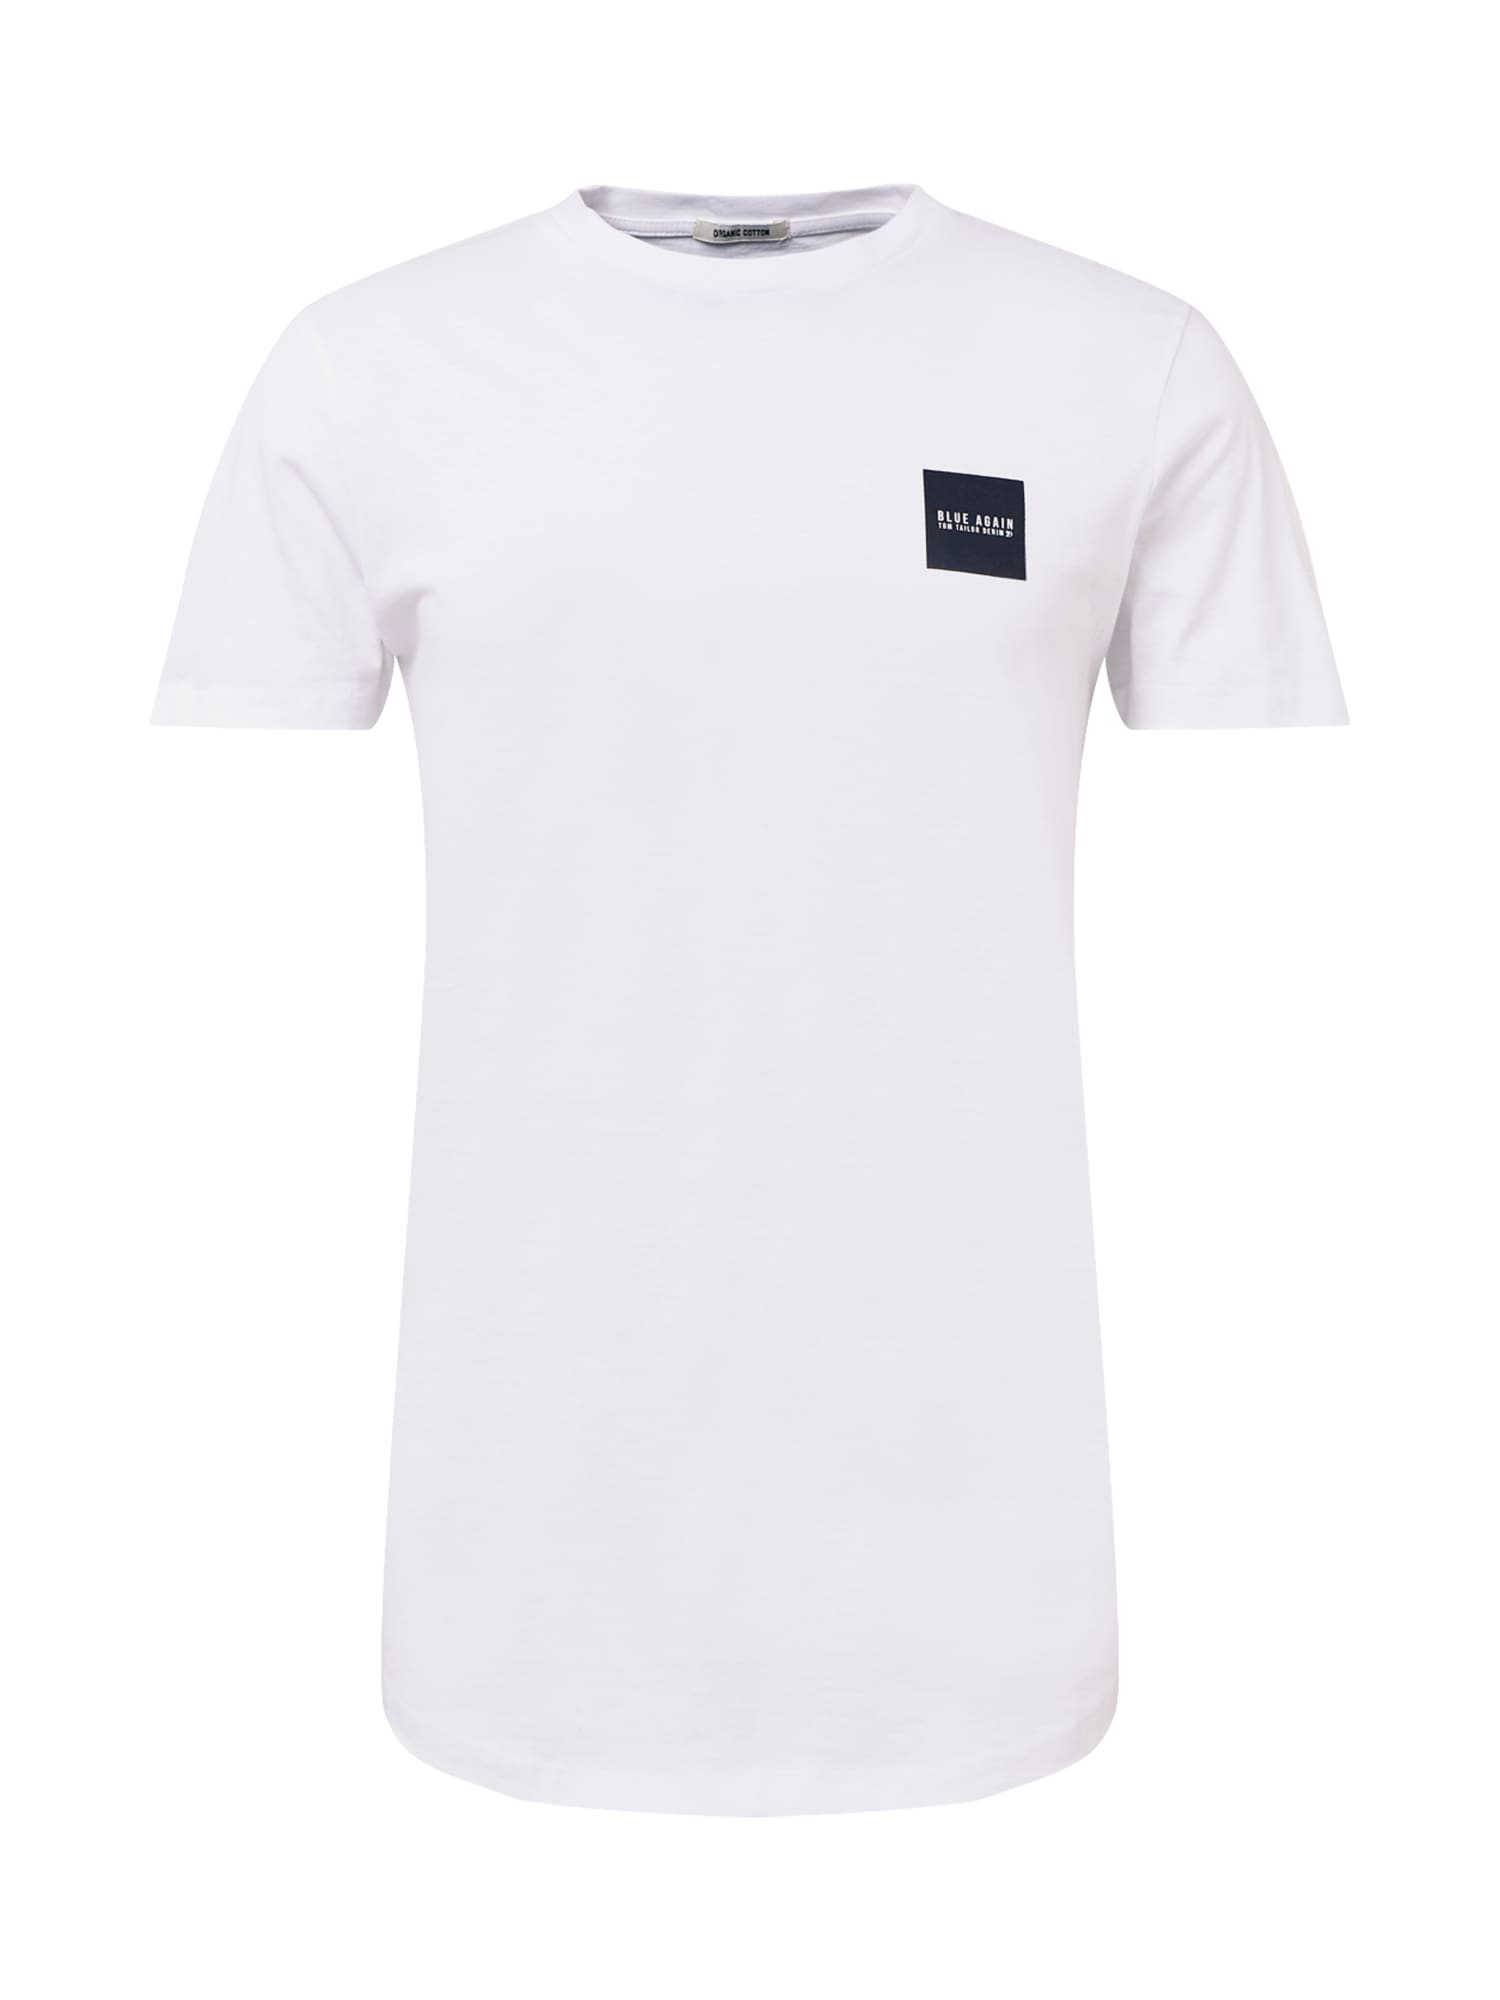 TOM TAILOR DENIM Tričko  bílá / tmavě modrá